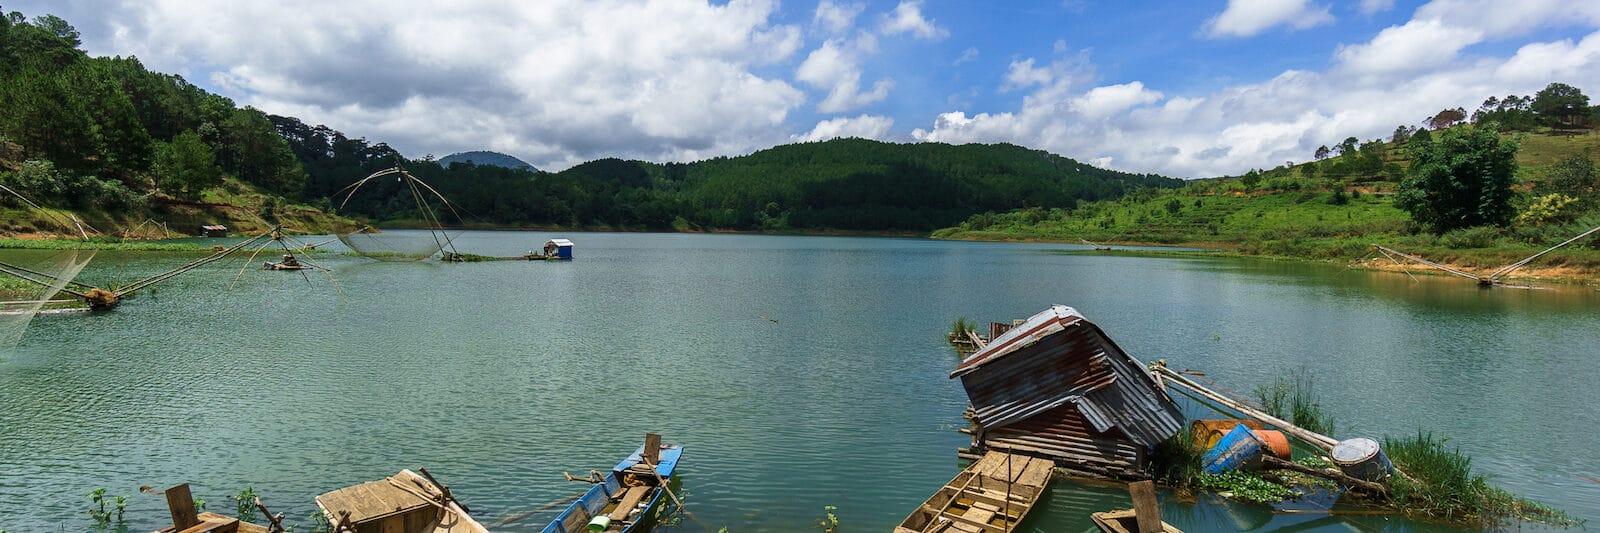 Tuyen Lam Lake, VN